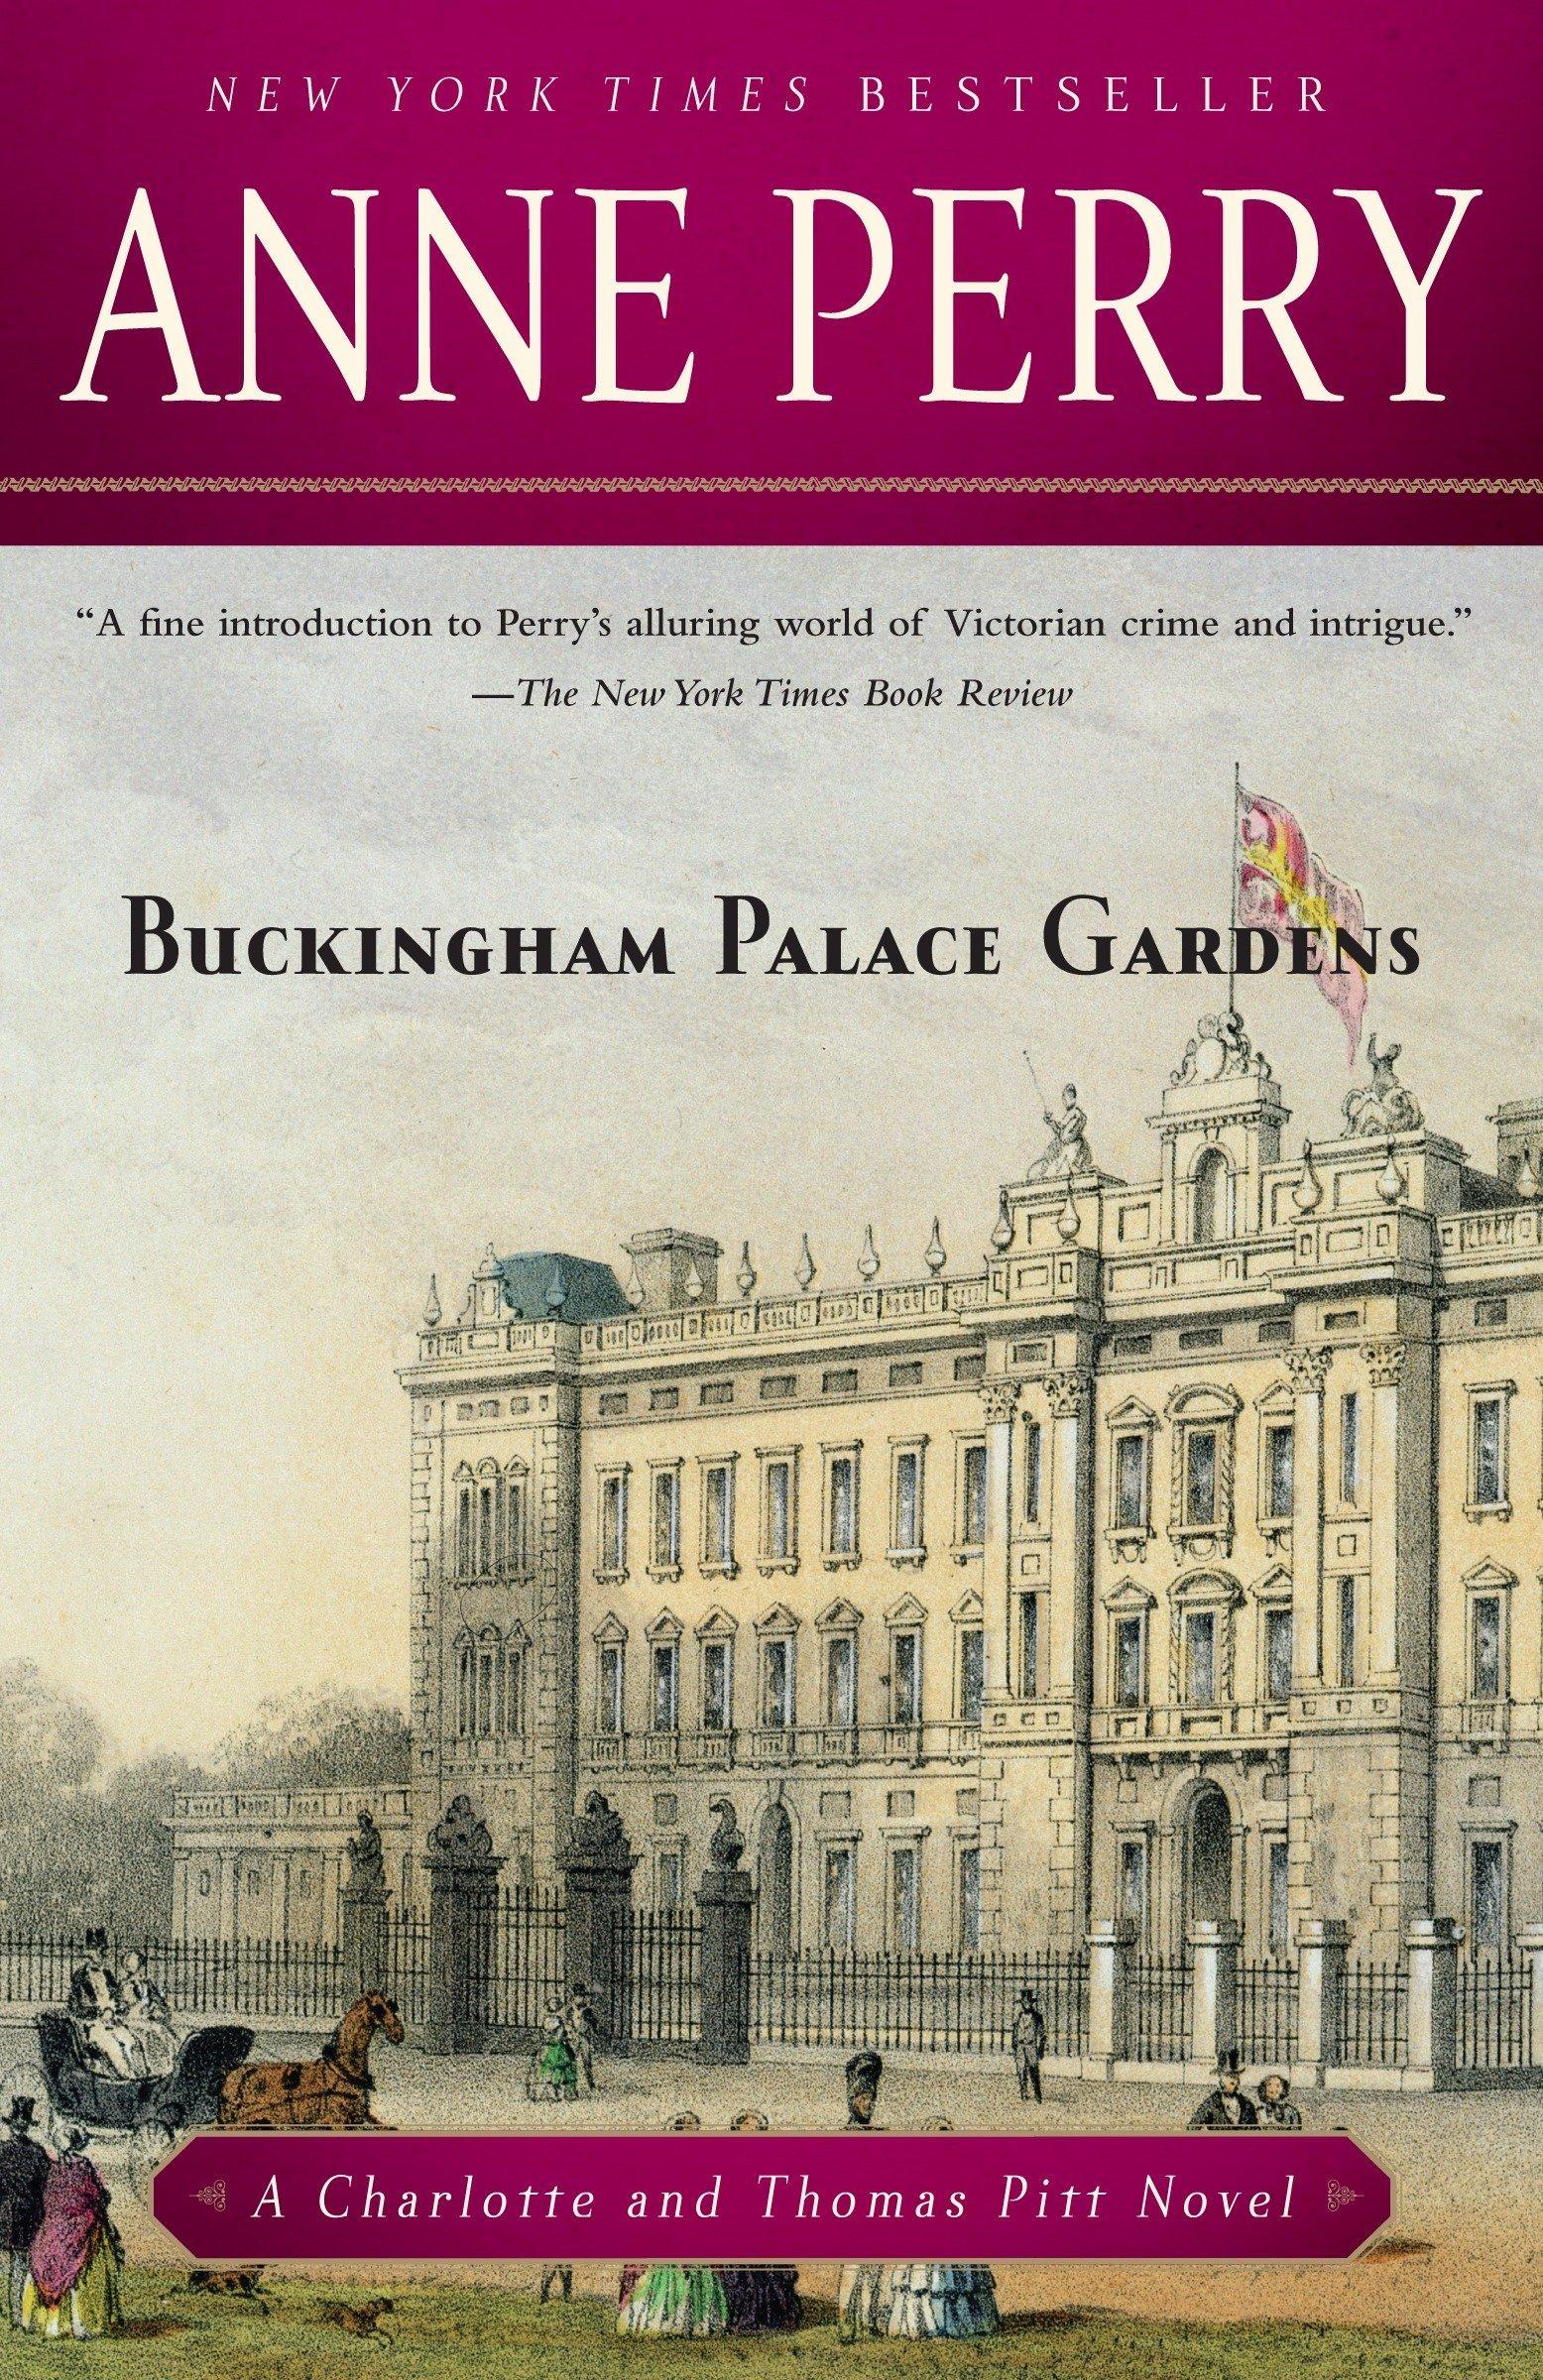 Download Buckingham Palace Gardens: A Charlotte and Thomas Pitt Novel ebook